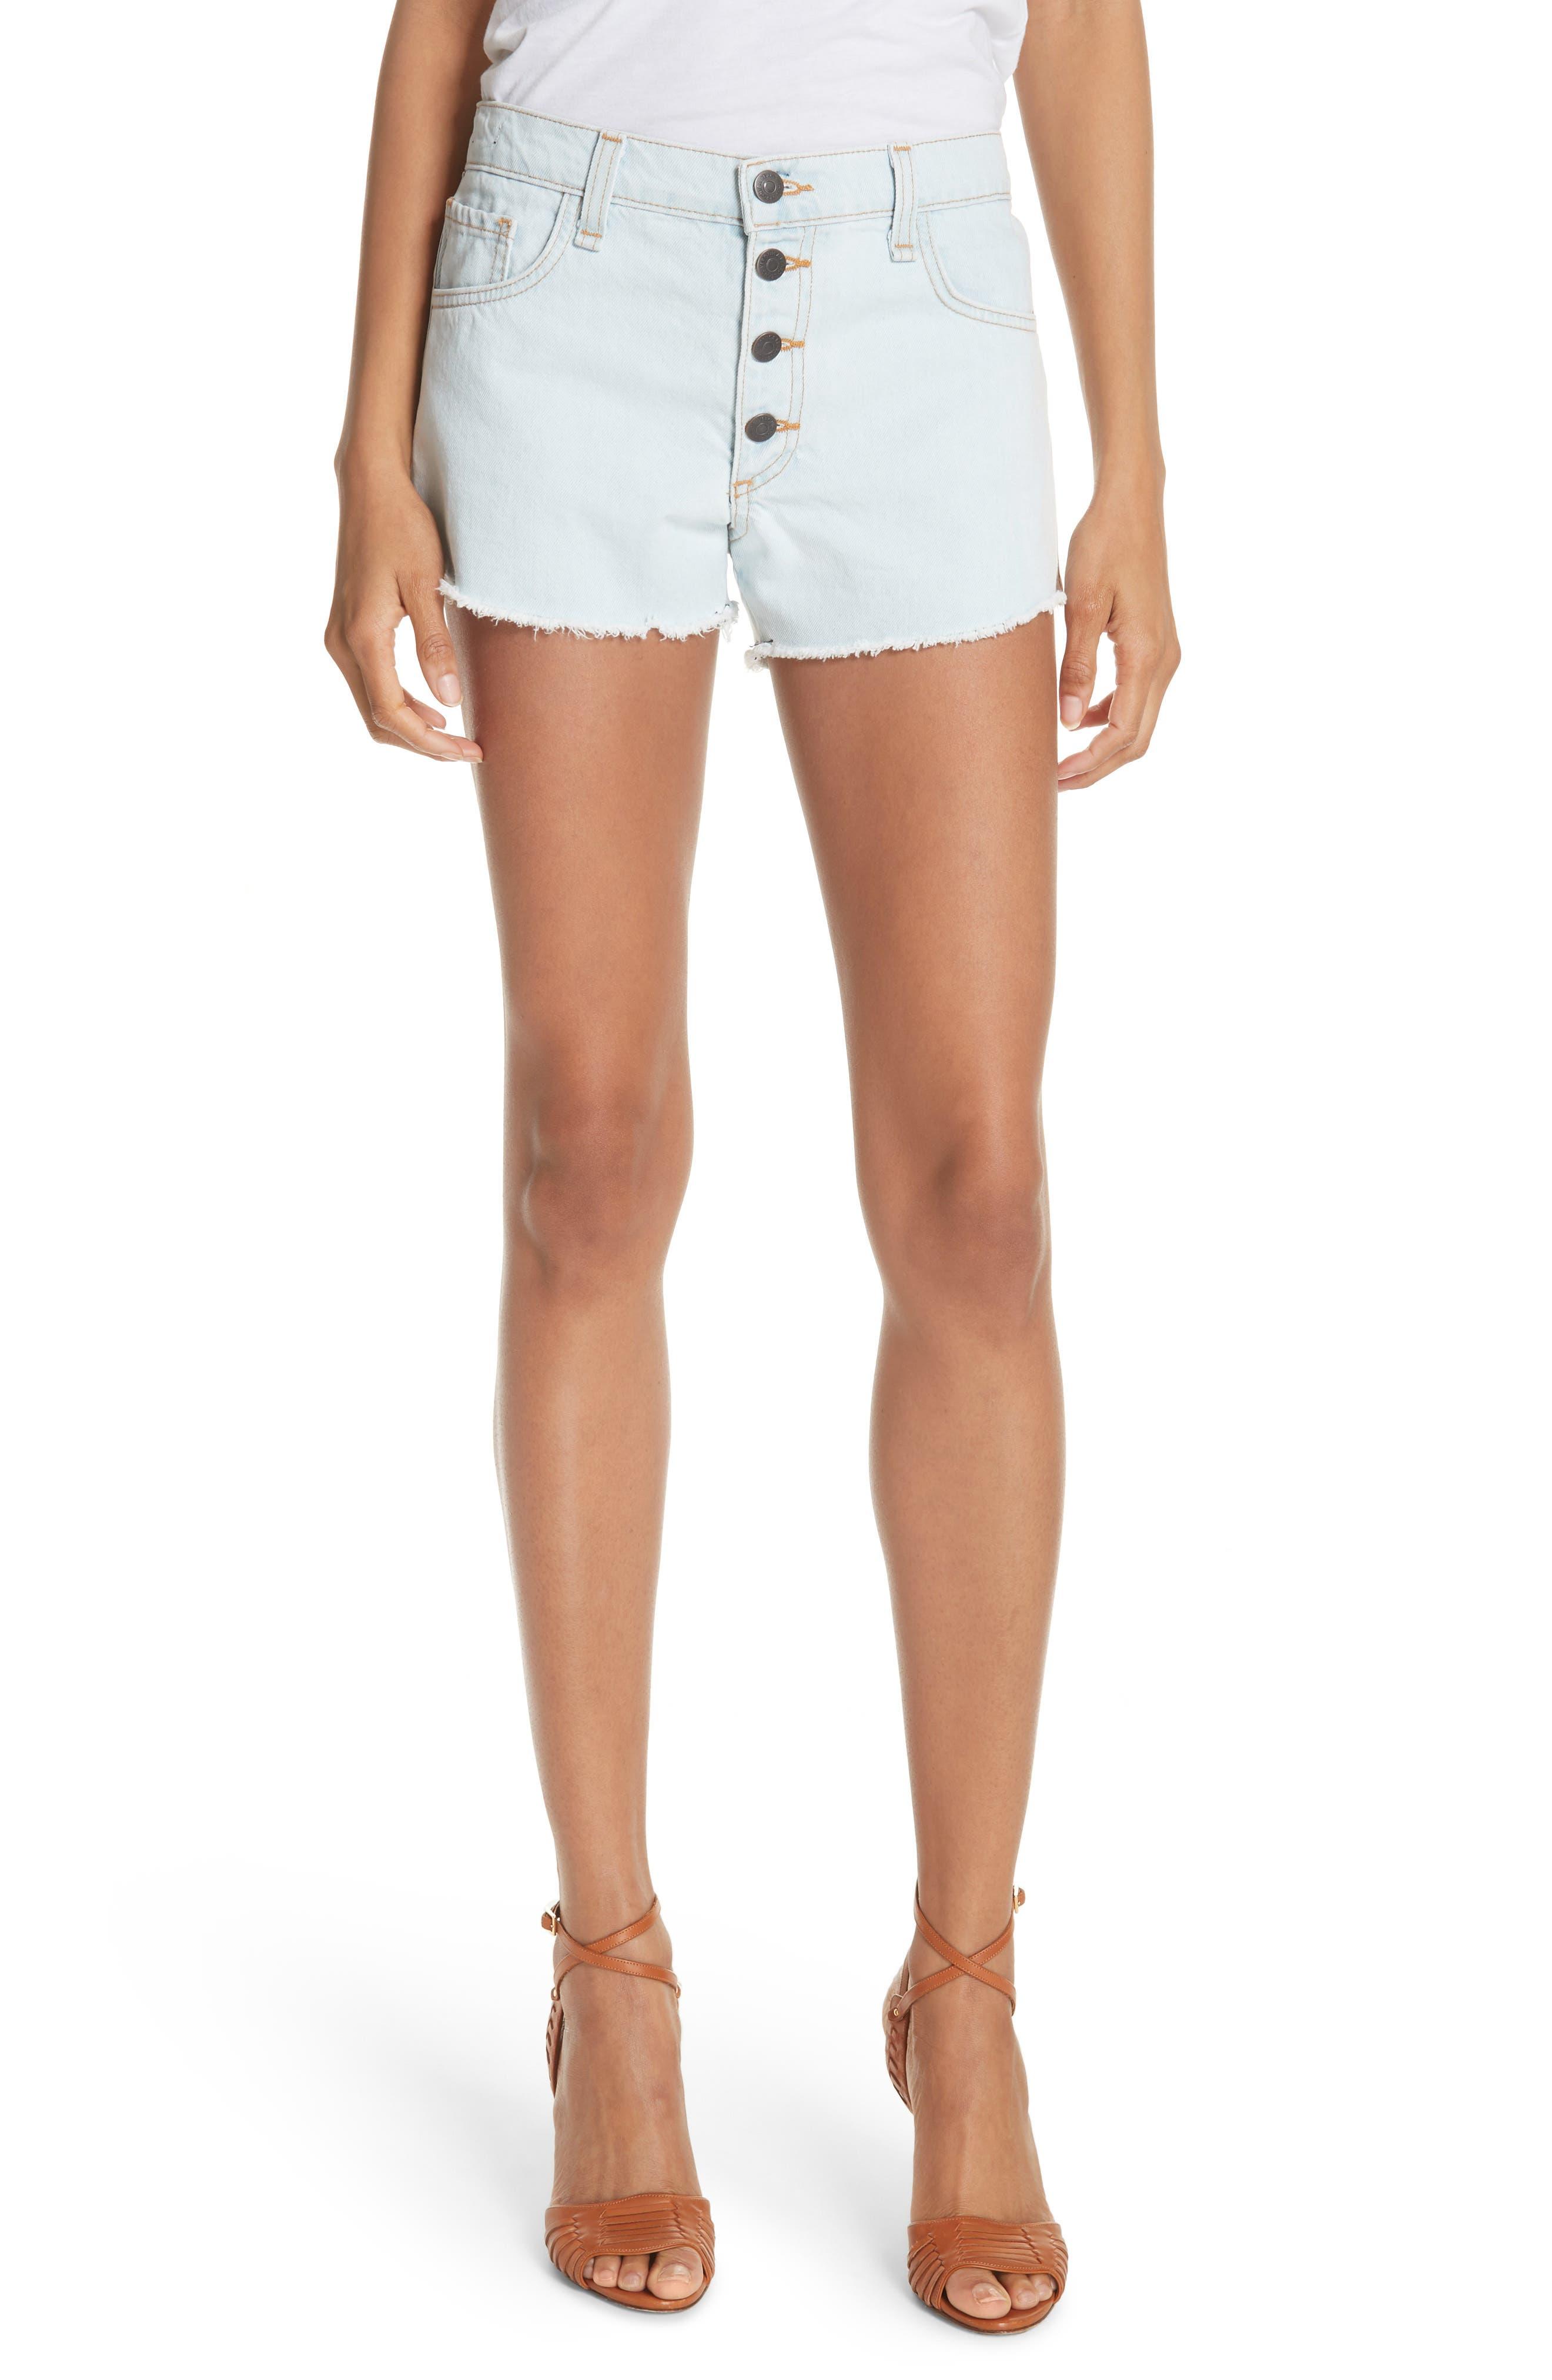 Veronica Beard Debbie Denim Shorts (Bleach) (Nordstrom Exclusive)